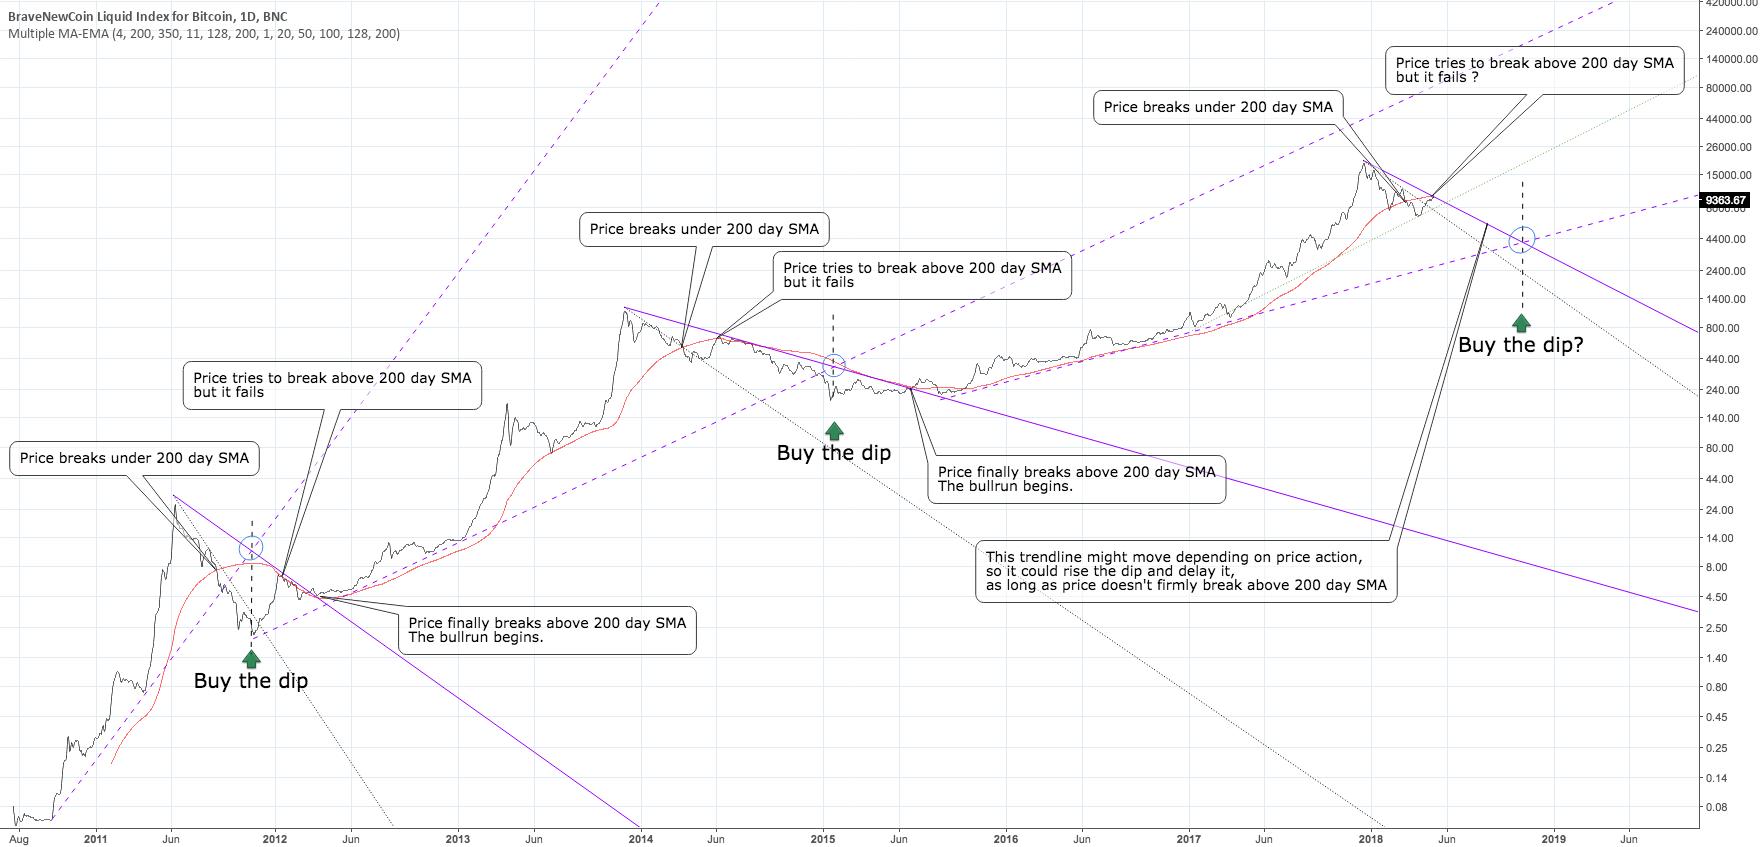 It looks like bitcoin bear market hasn't ended